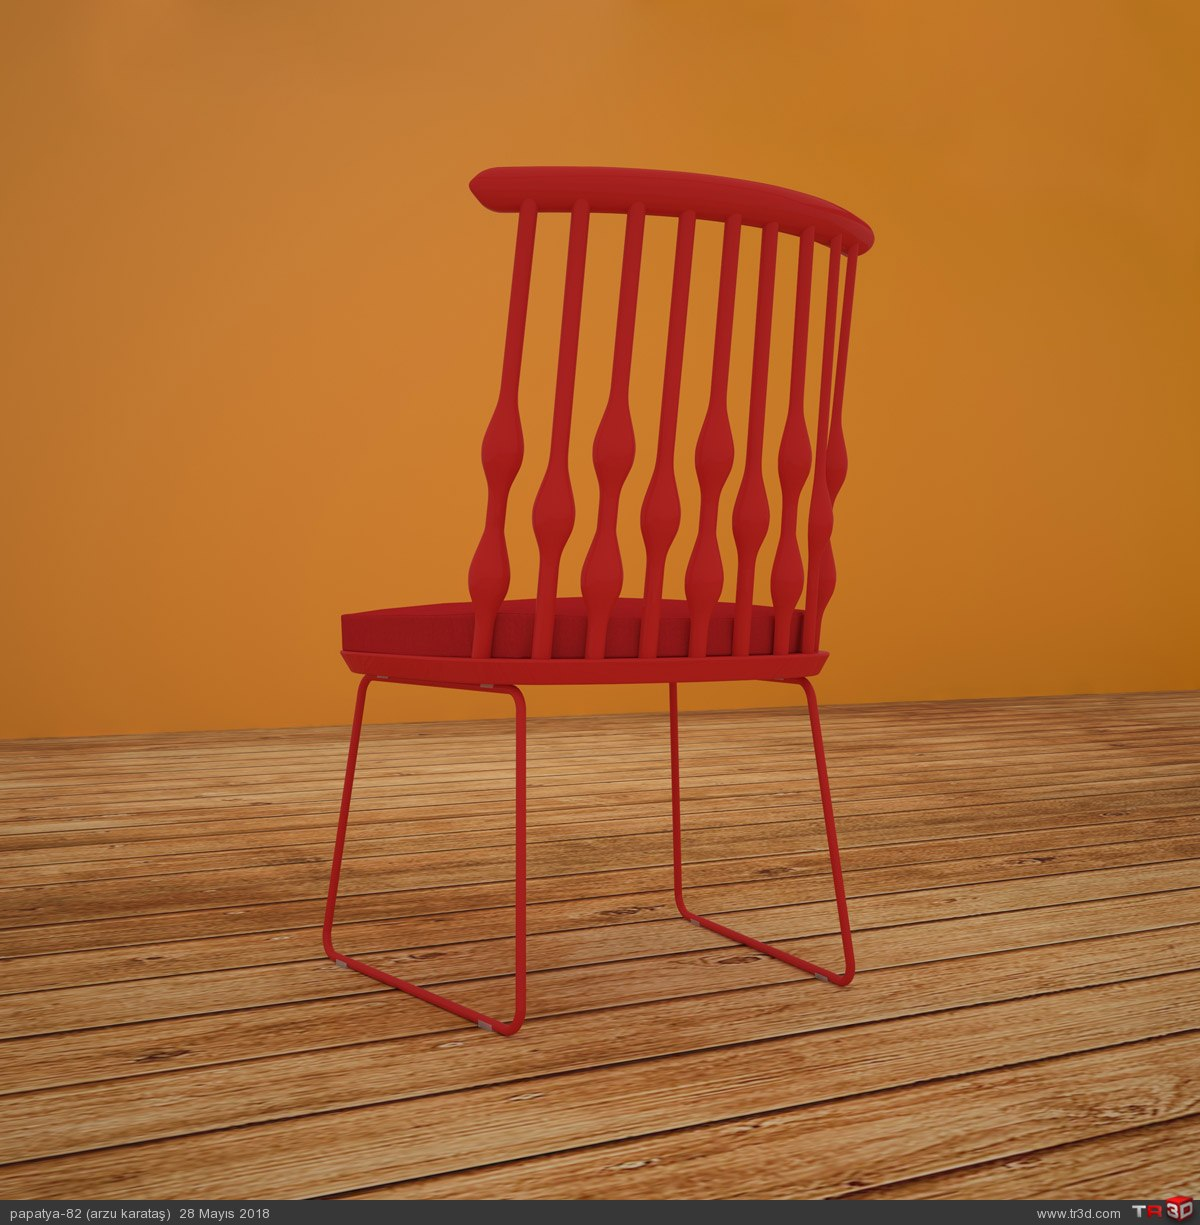 design by patricia urquiola nub chair-2 3